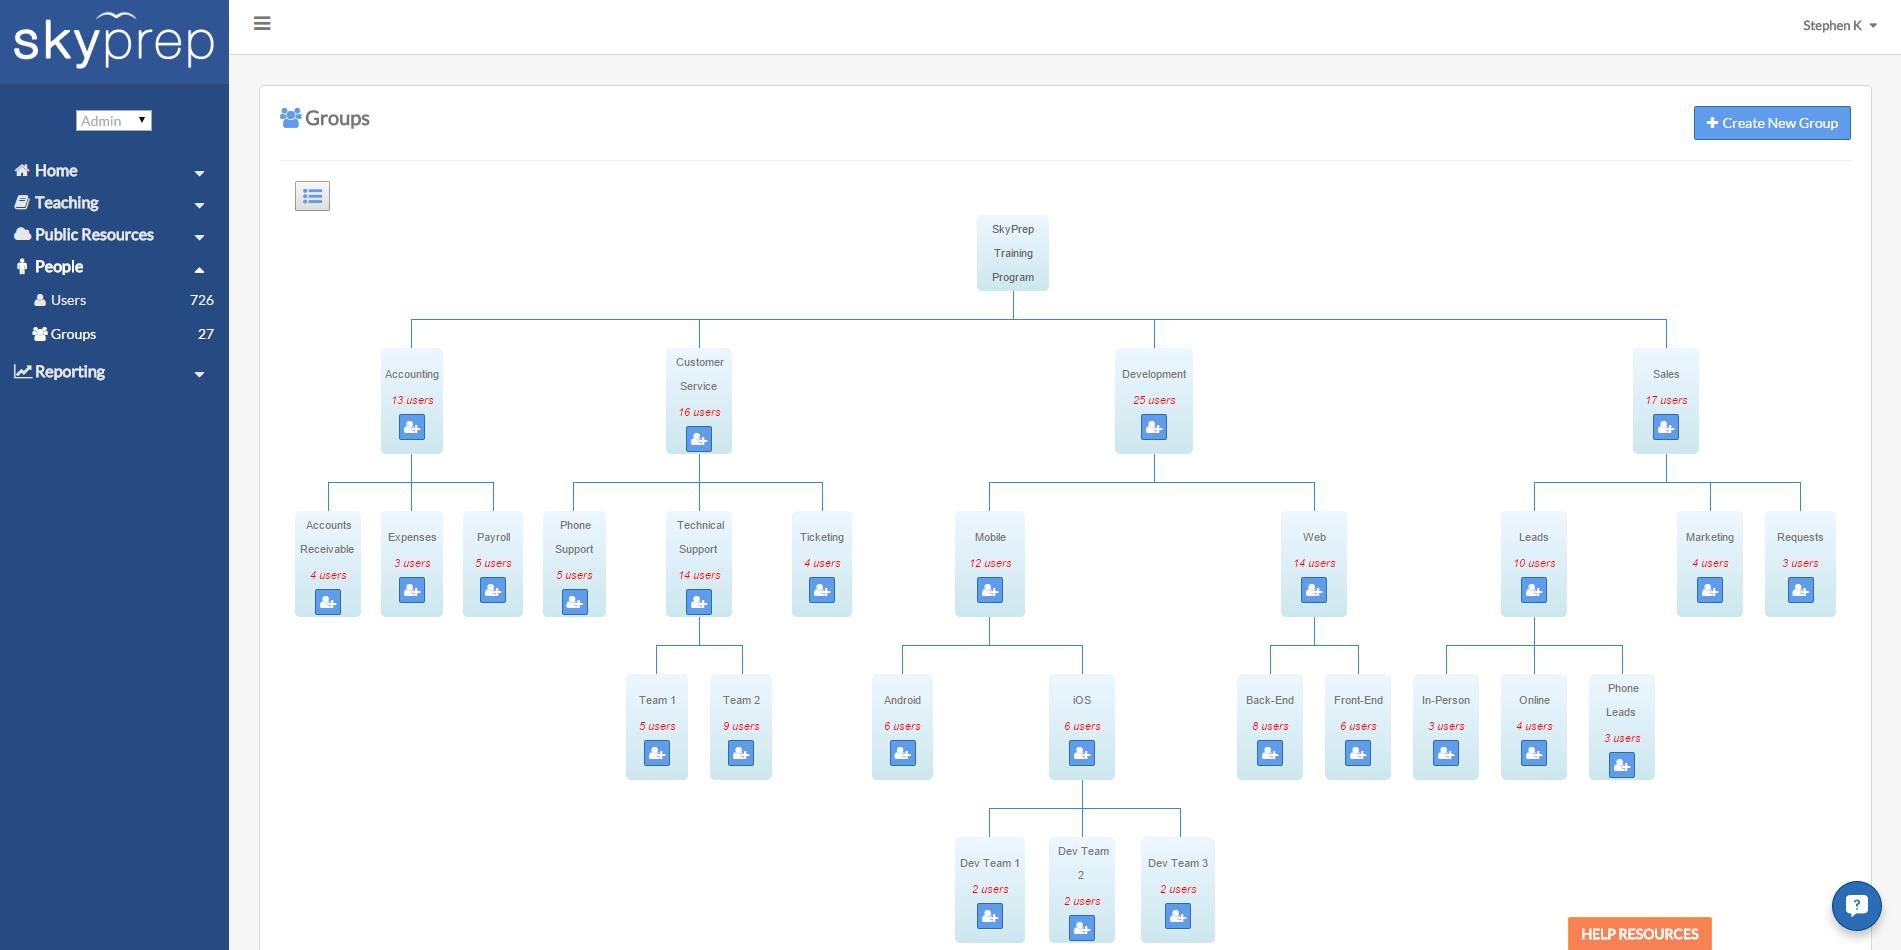 SkyPrep Demo - SkyPrep Admin User Group Hierarchy View